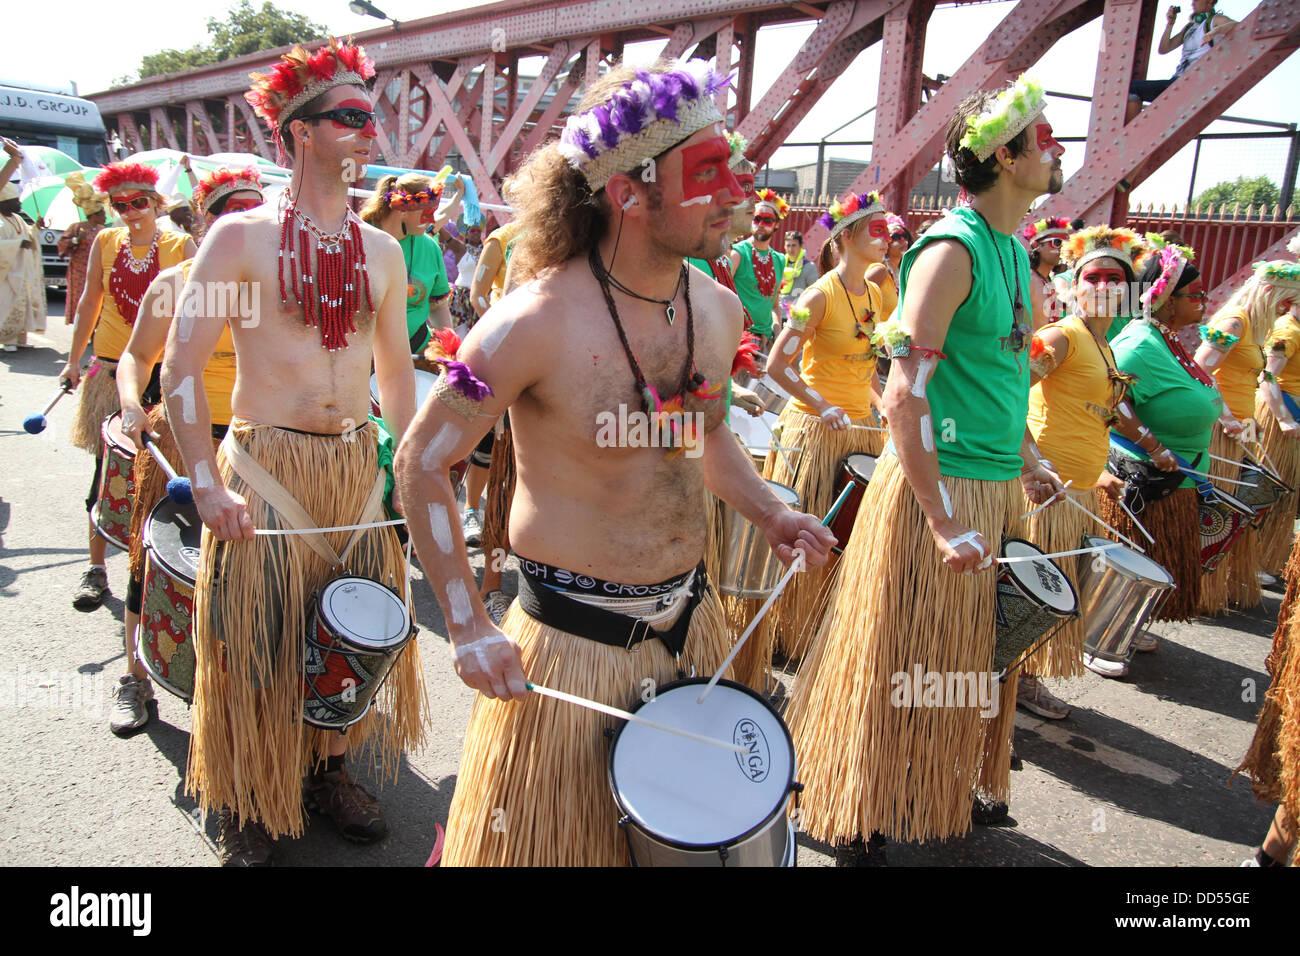 London, UK. 26 August 2013. Drummers entertain crowds on Kensal Road. Credit: David Mbiyu/ Alamy Live News Stock Photo